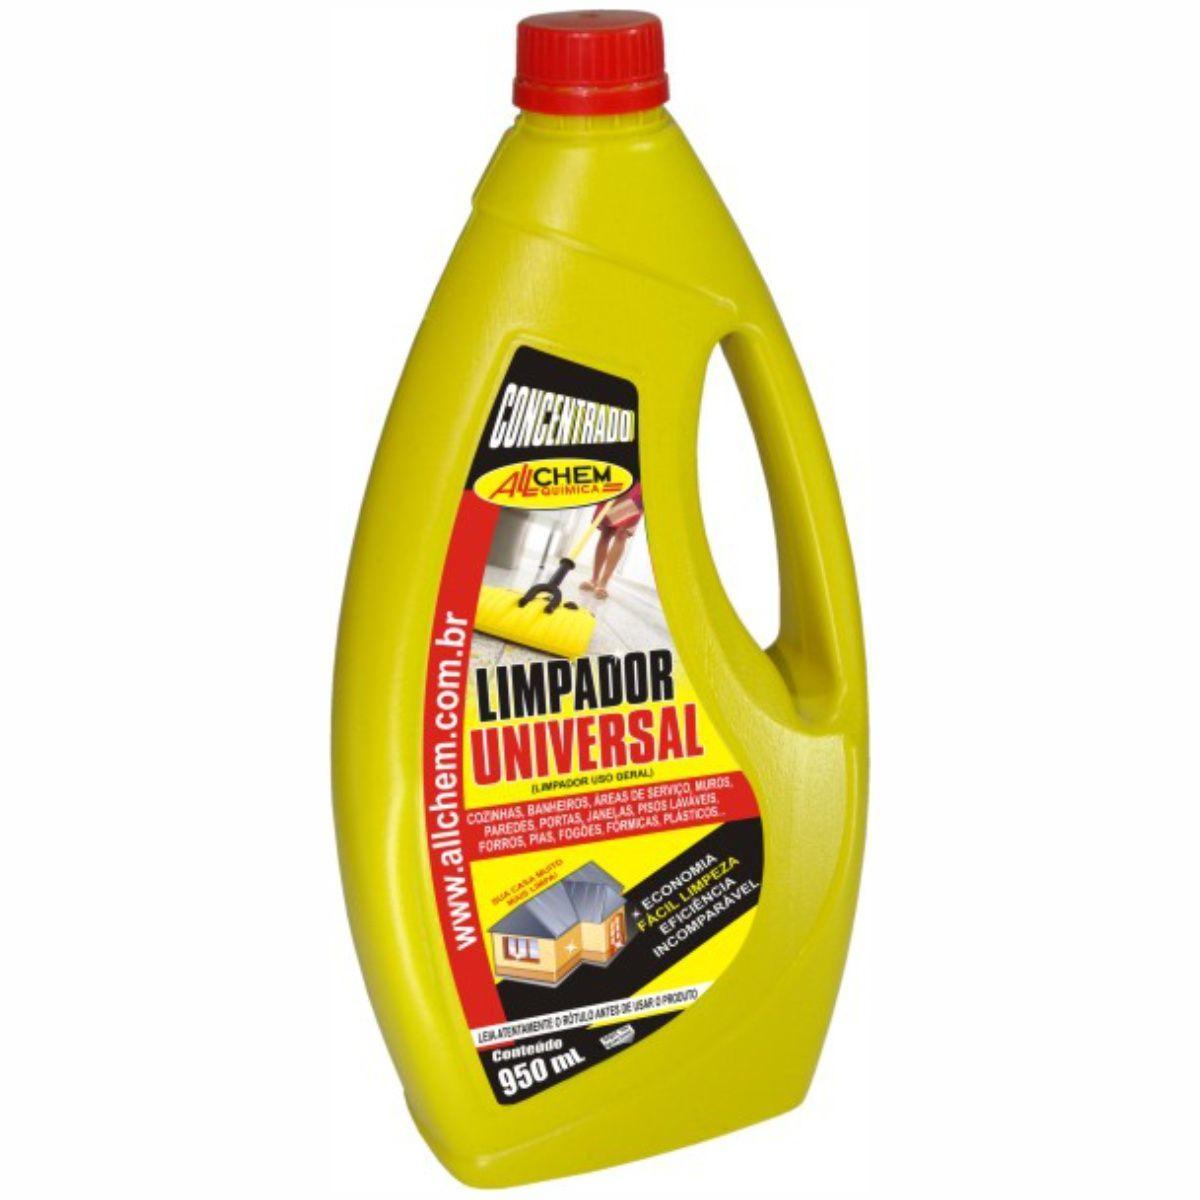 limpador-universal-allchem